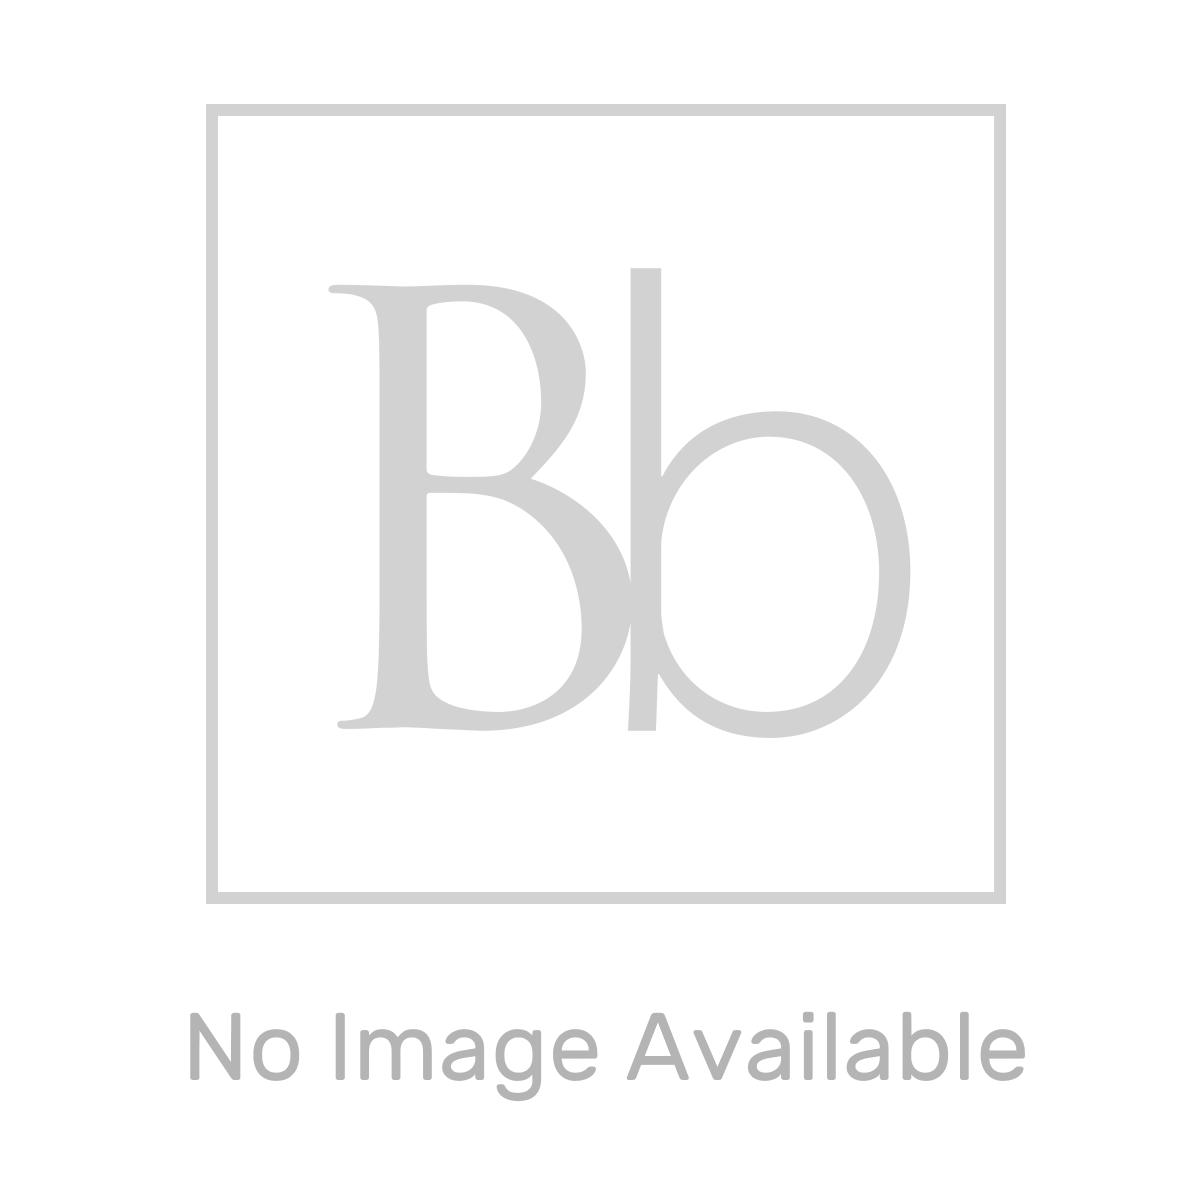 Hudson Reed Art Triple Chrome Concealed Thermostatic Shower Valve